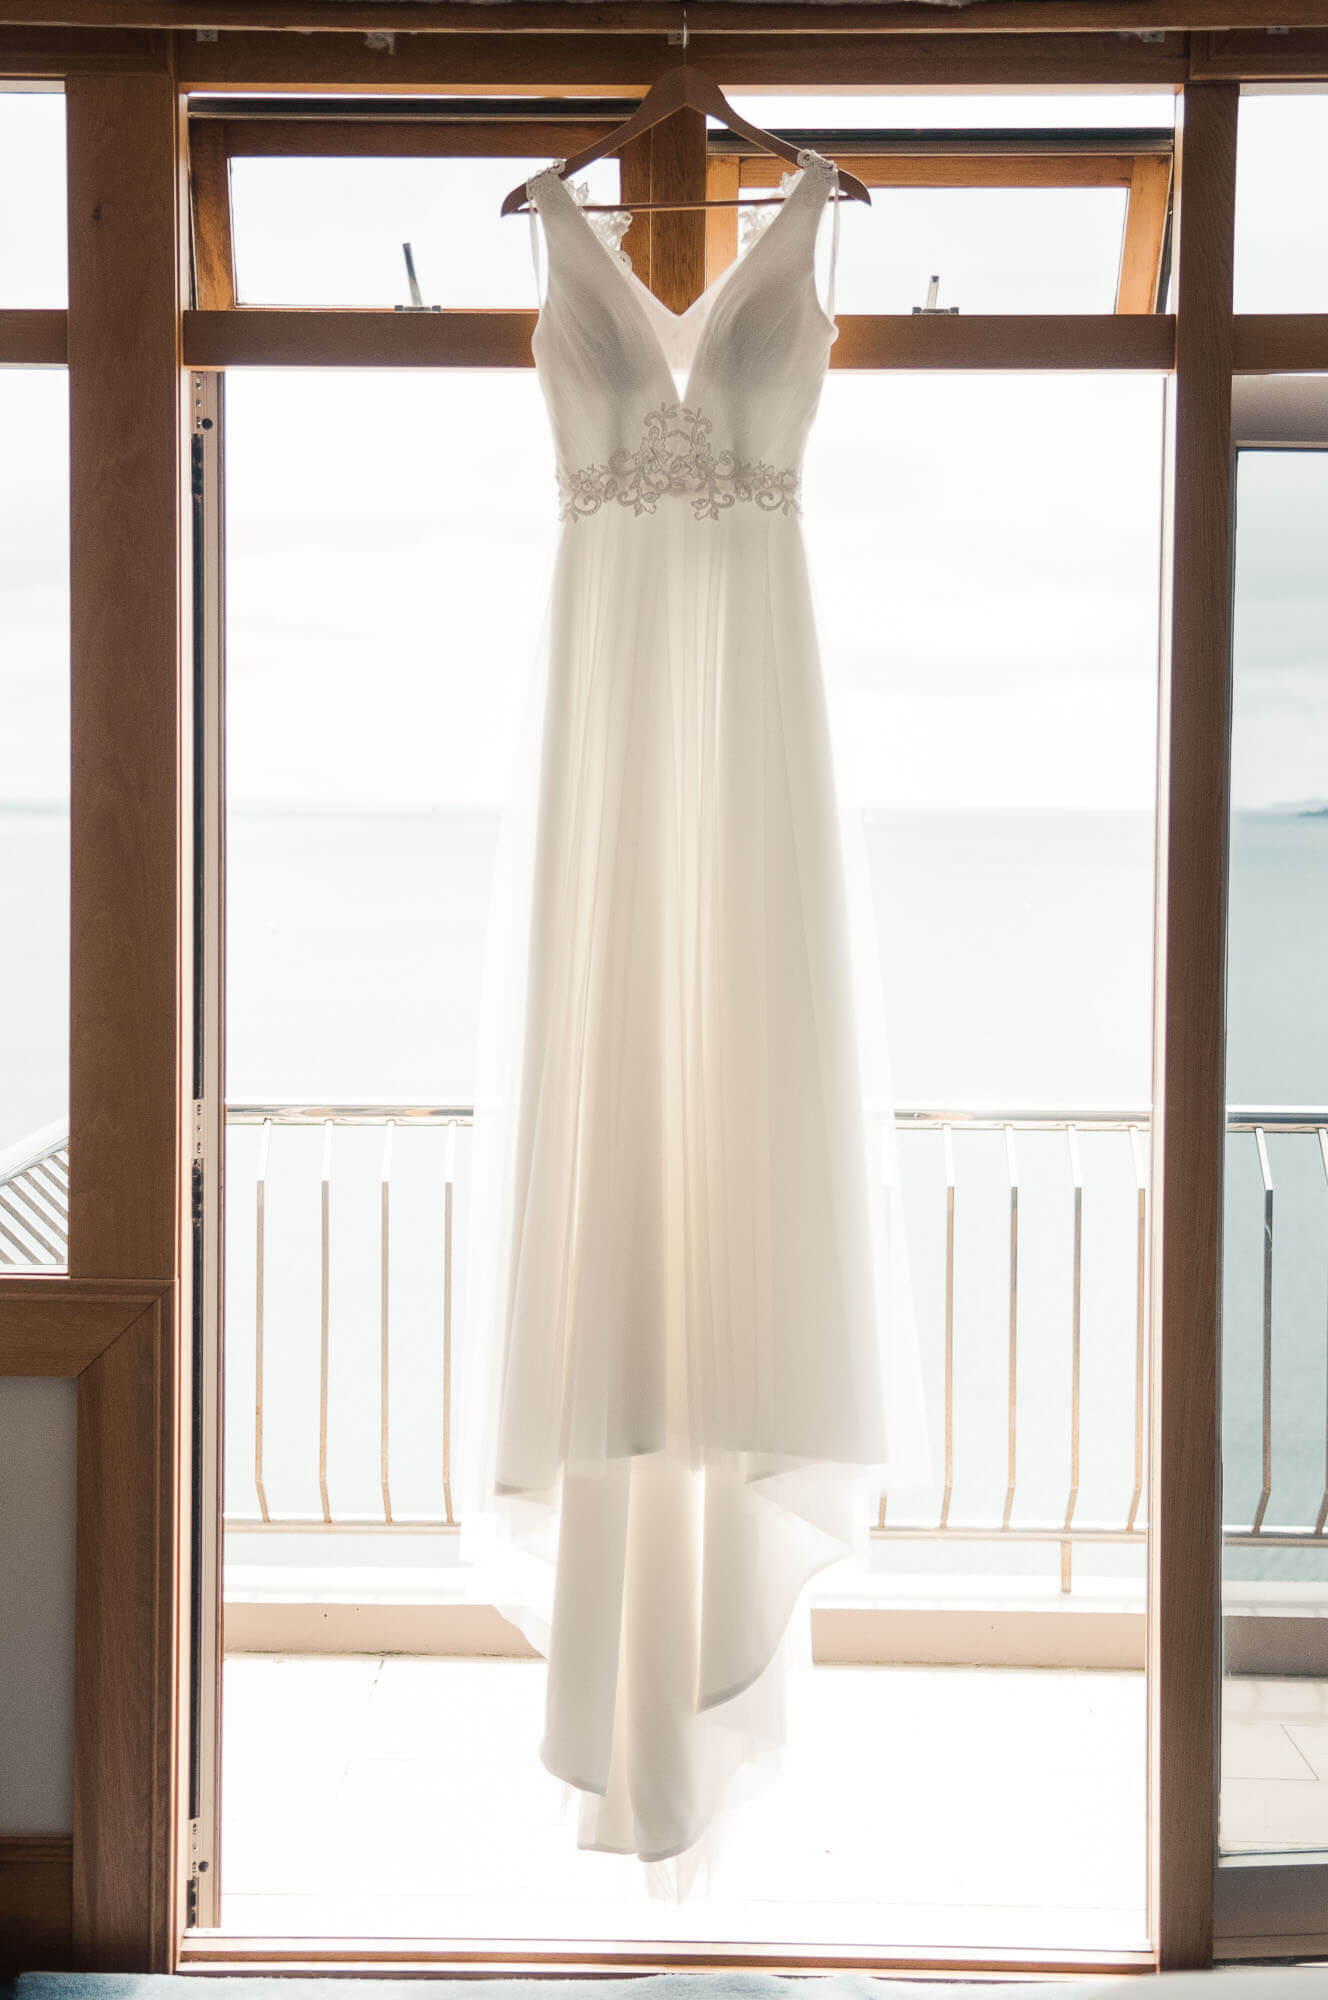 wedding-dress-hanging-in-window.jpg